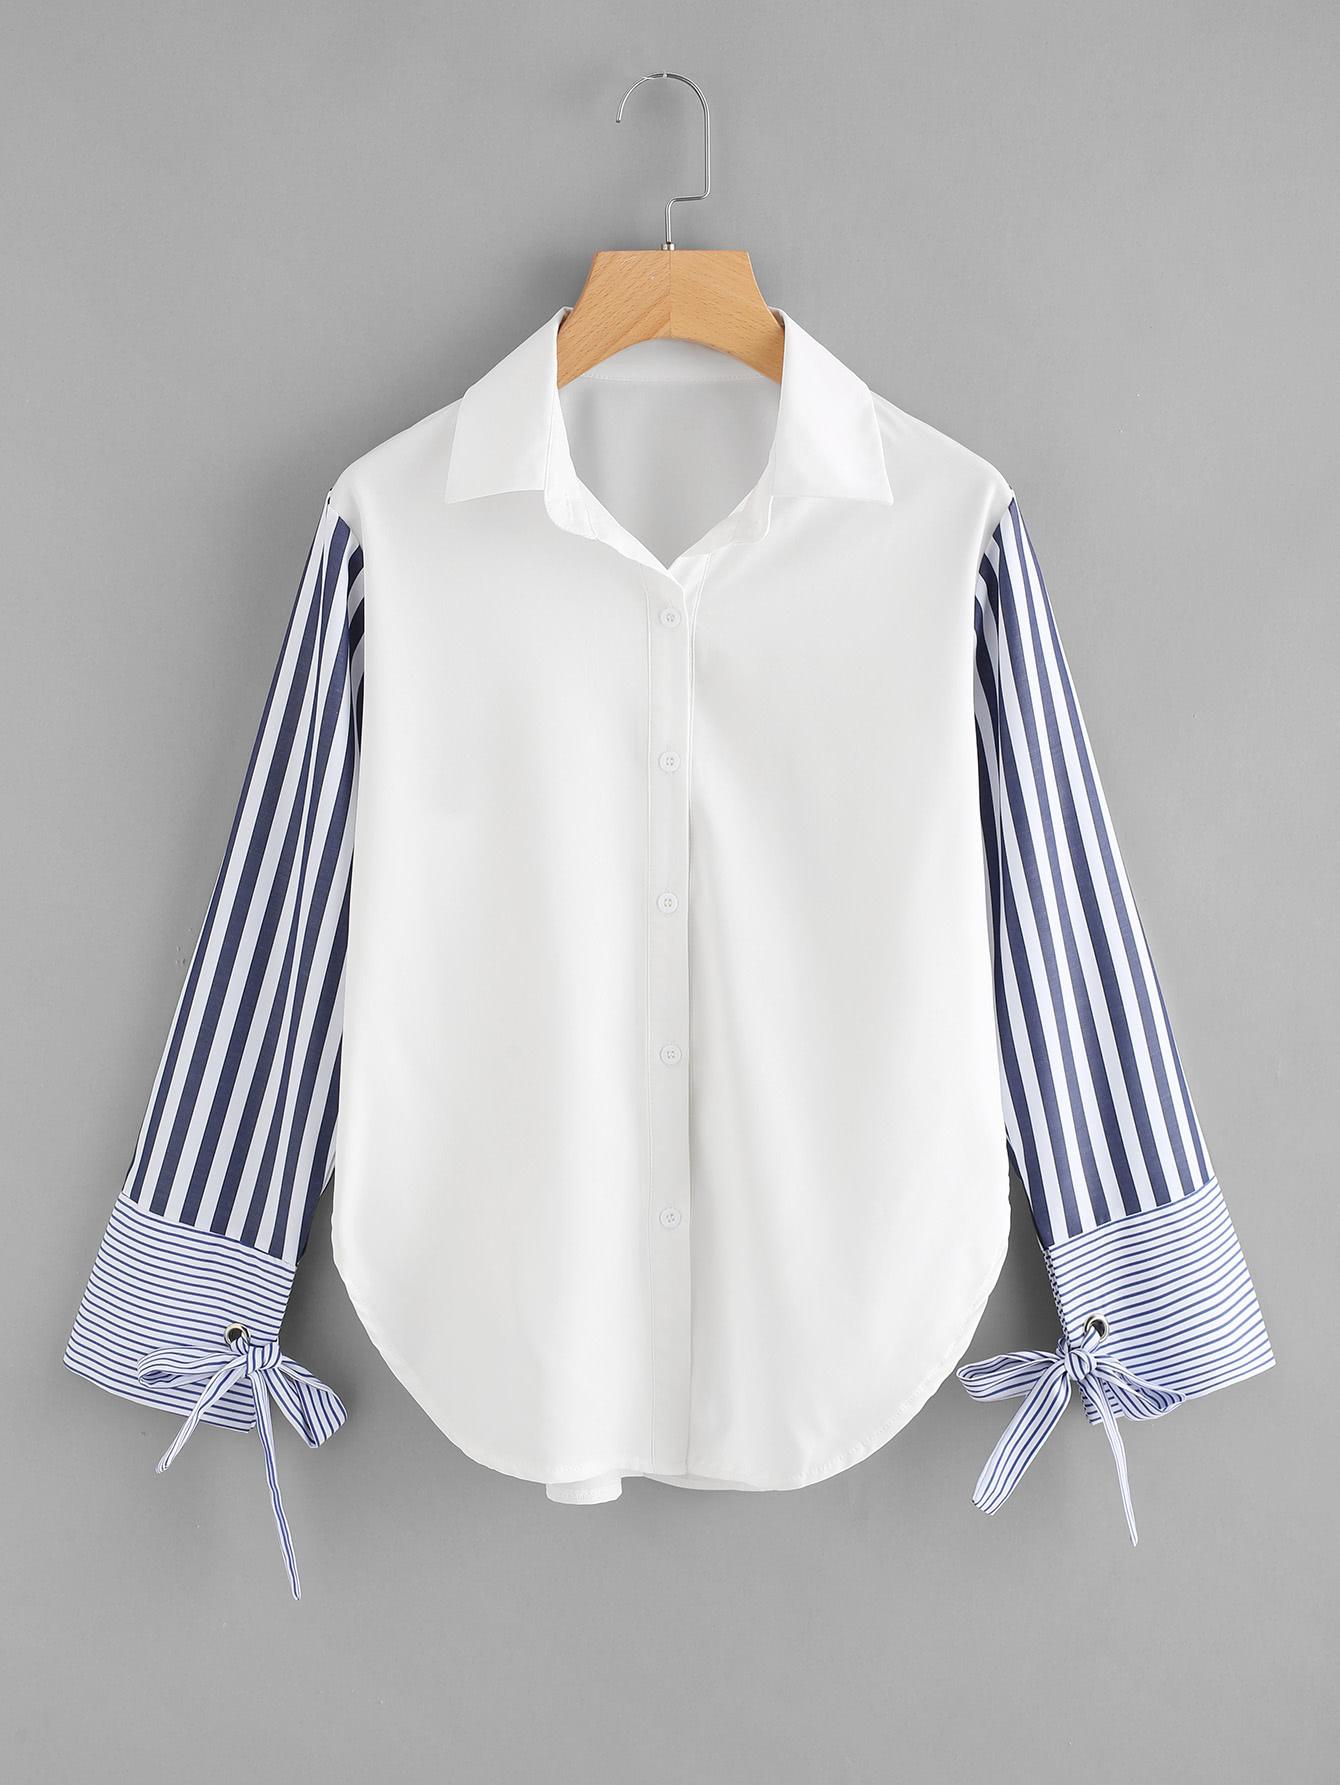 Contrast Striped Sleeve Tie Detail Curved Hem Shirt curved hem striped shirt dress